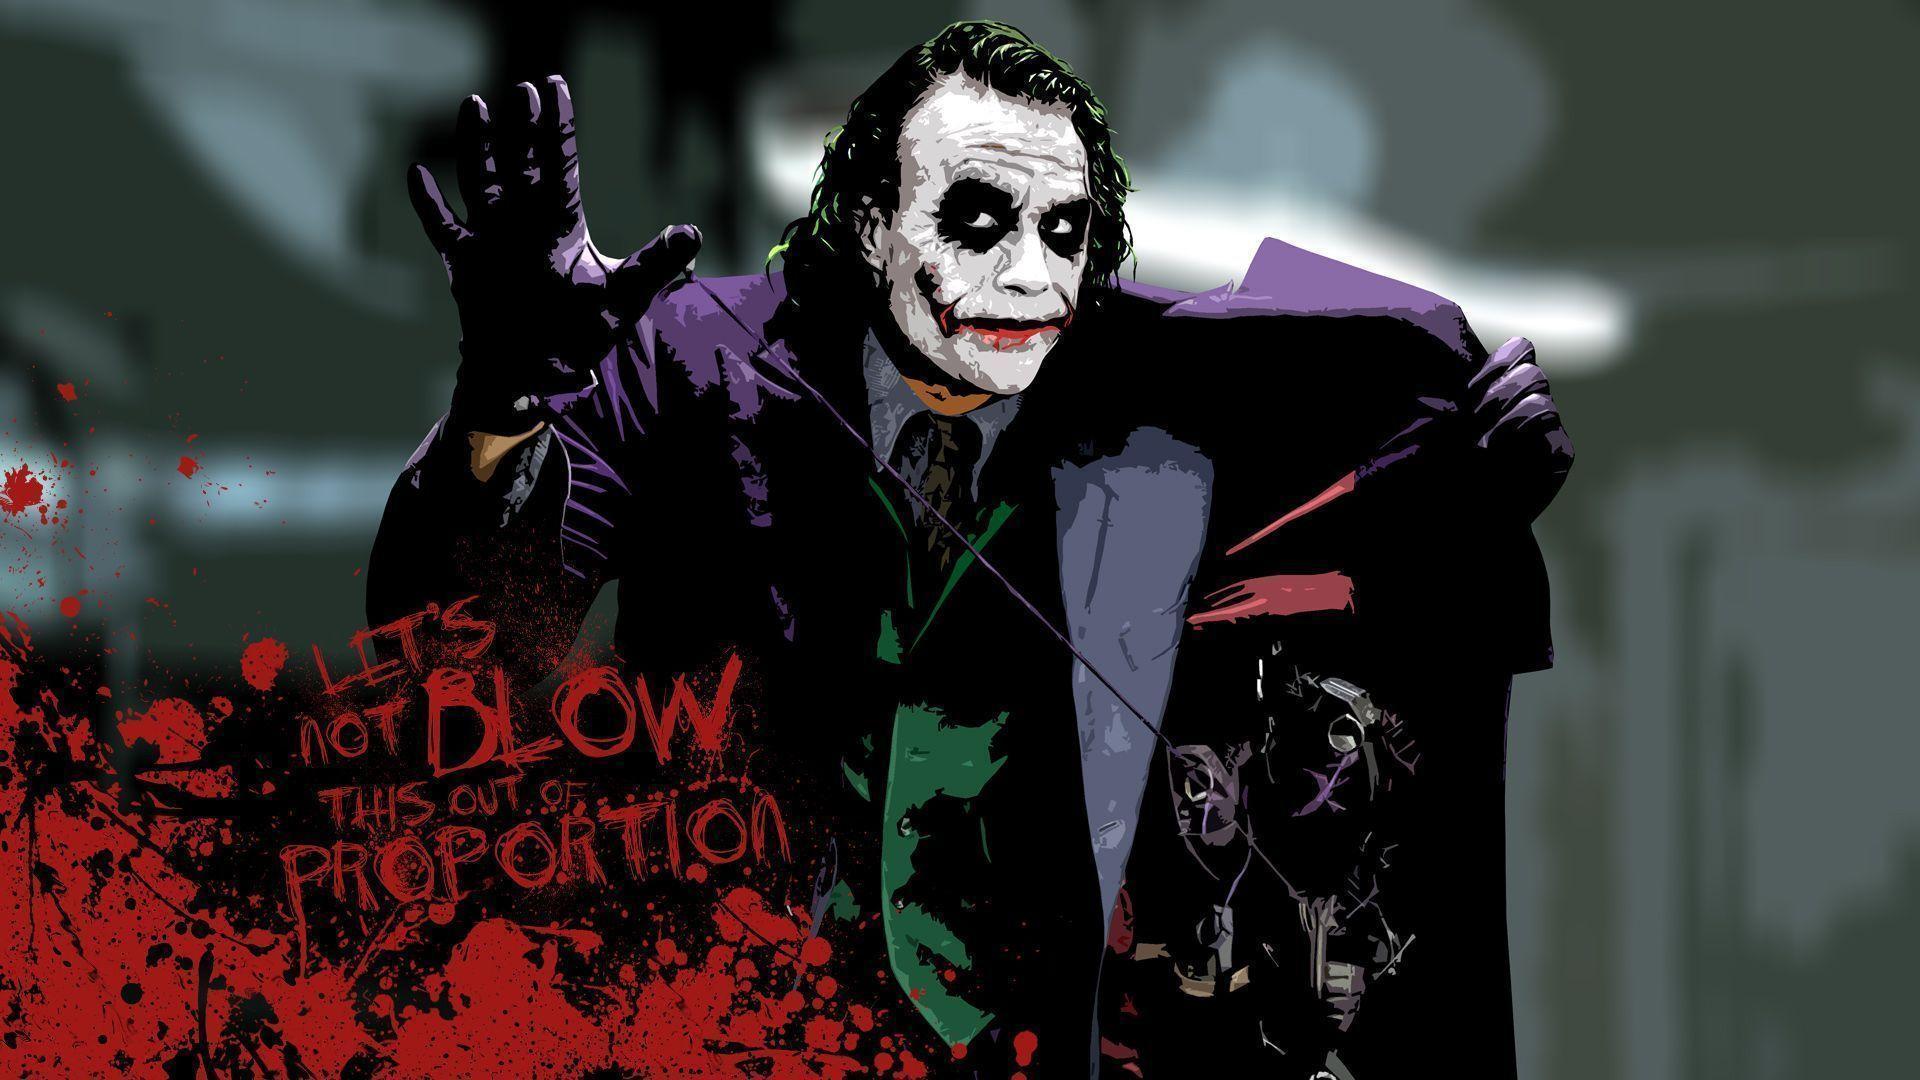 Heath Ledger Joker Wallpapers Wallpaper Cave